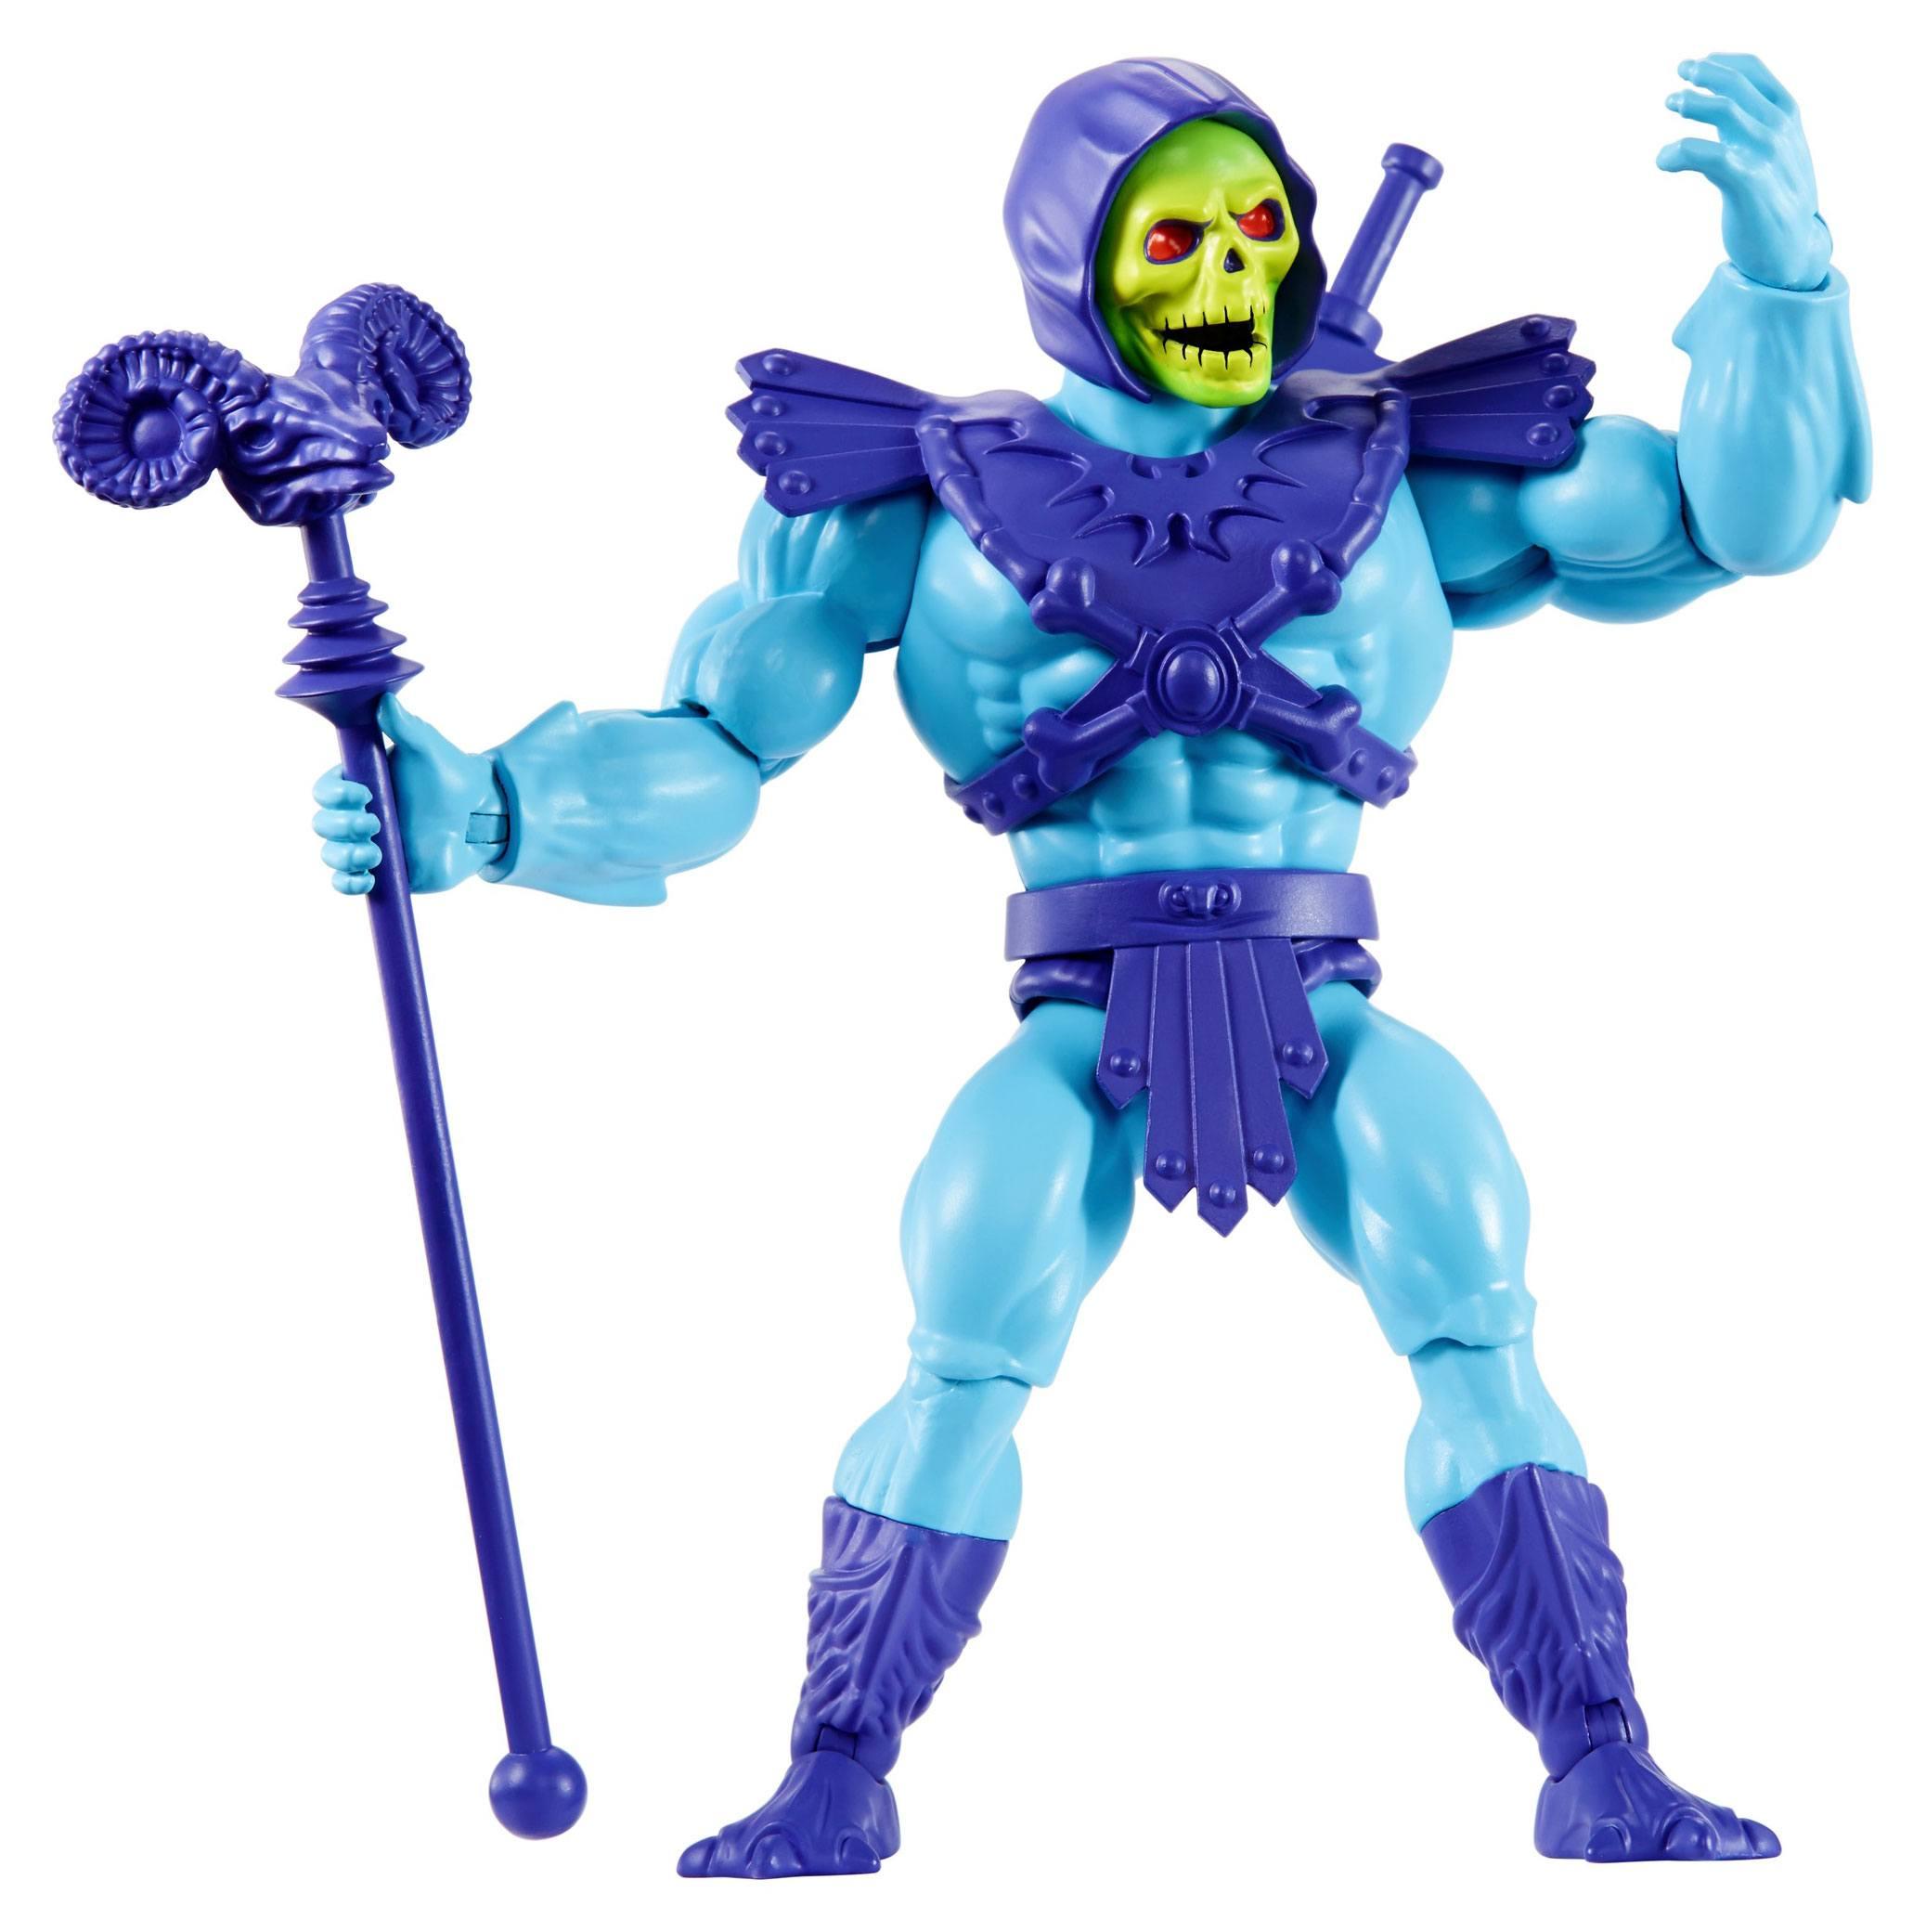 Masters of the Universe Origins Actionfigur 2020 Skeletor 14 cm MATTGNN88 0887961875409